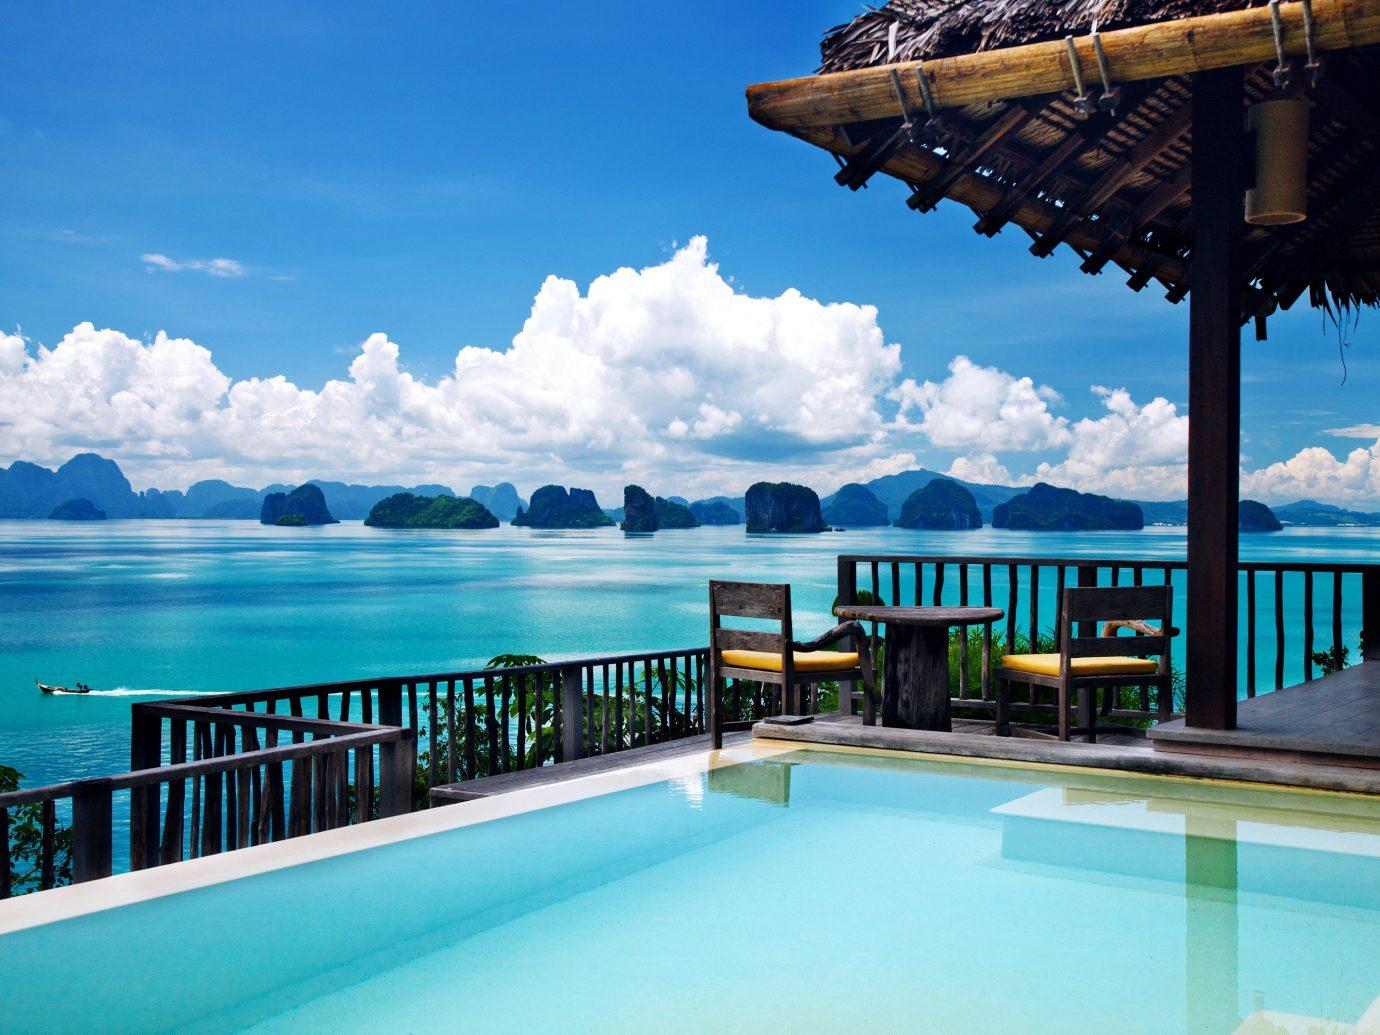 Hotels sky water outdoor leisure chair swimming pool vacation Resort Ocean Sea estate caribbean Pool bay overlooking swimming